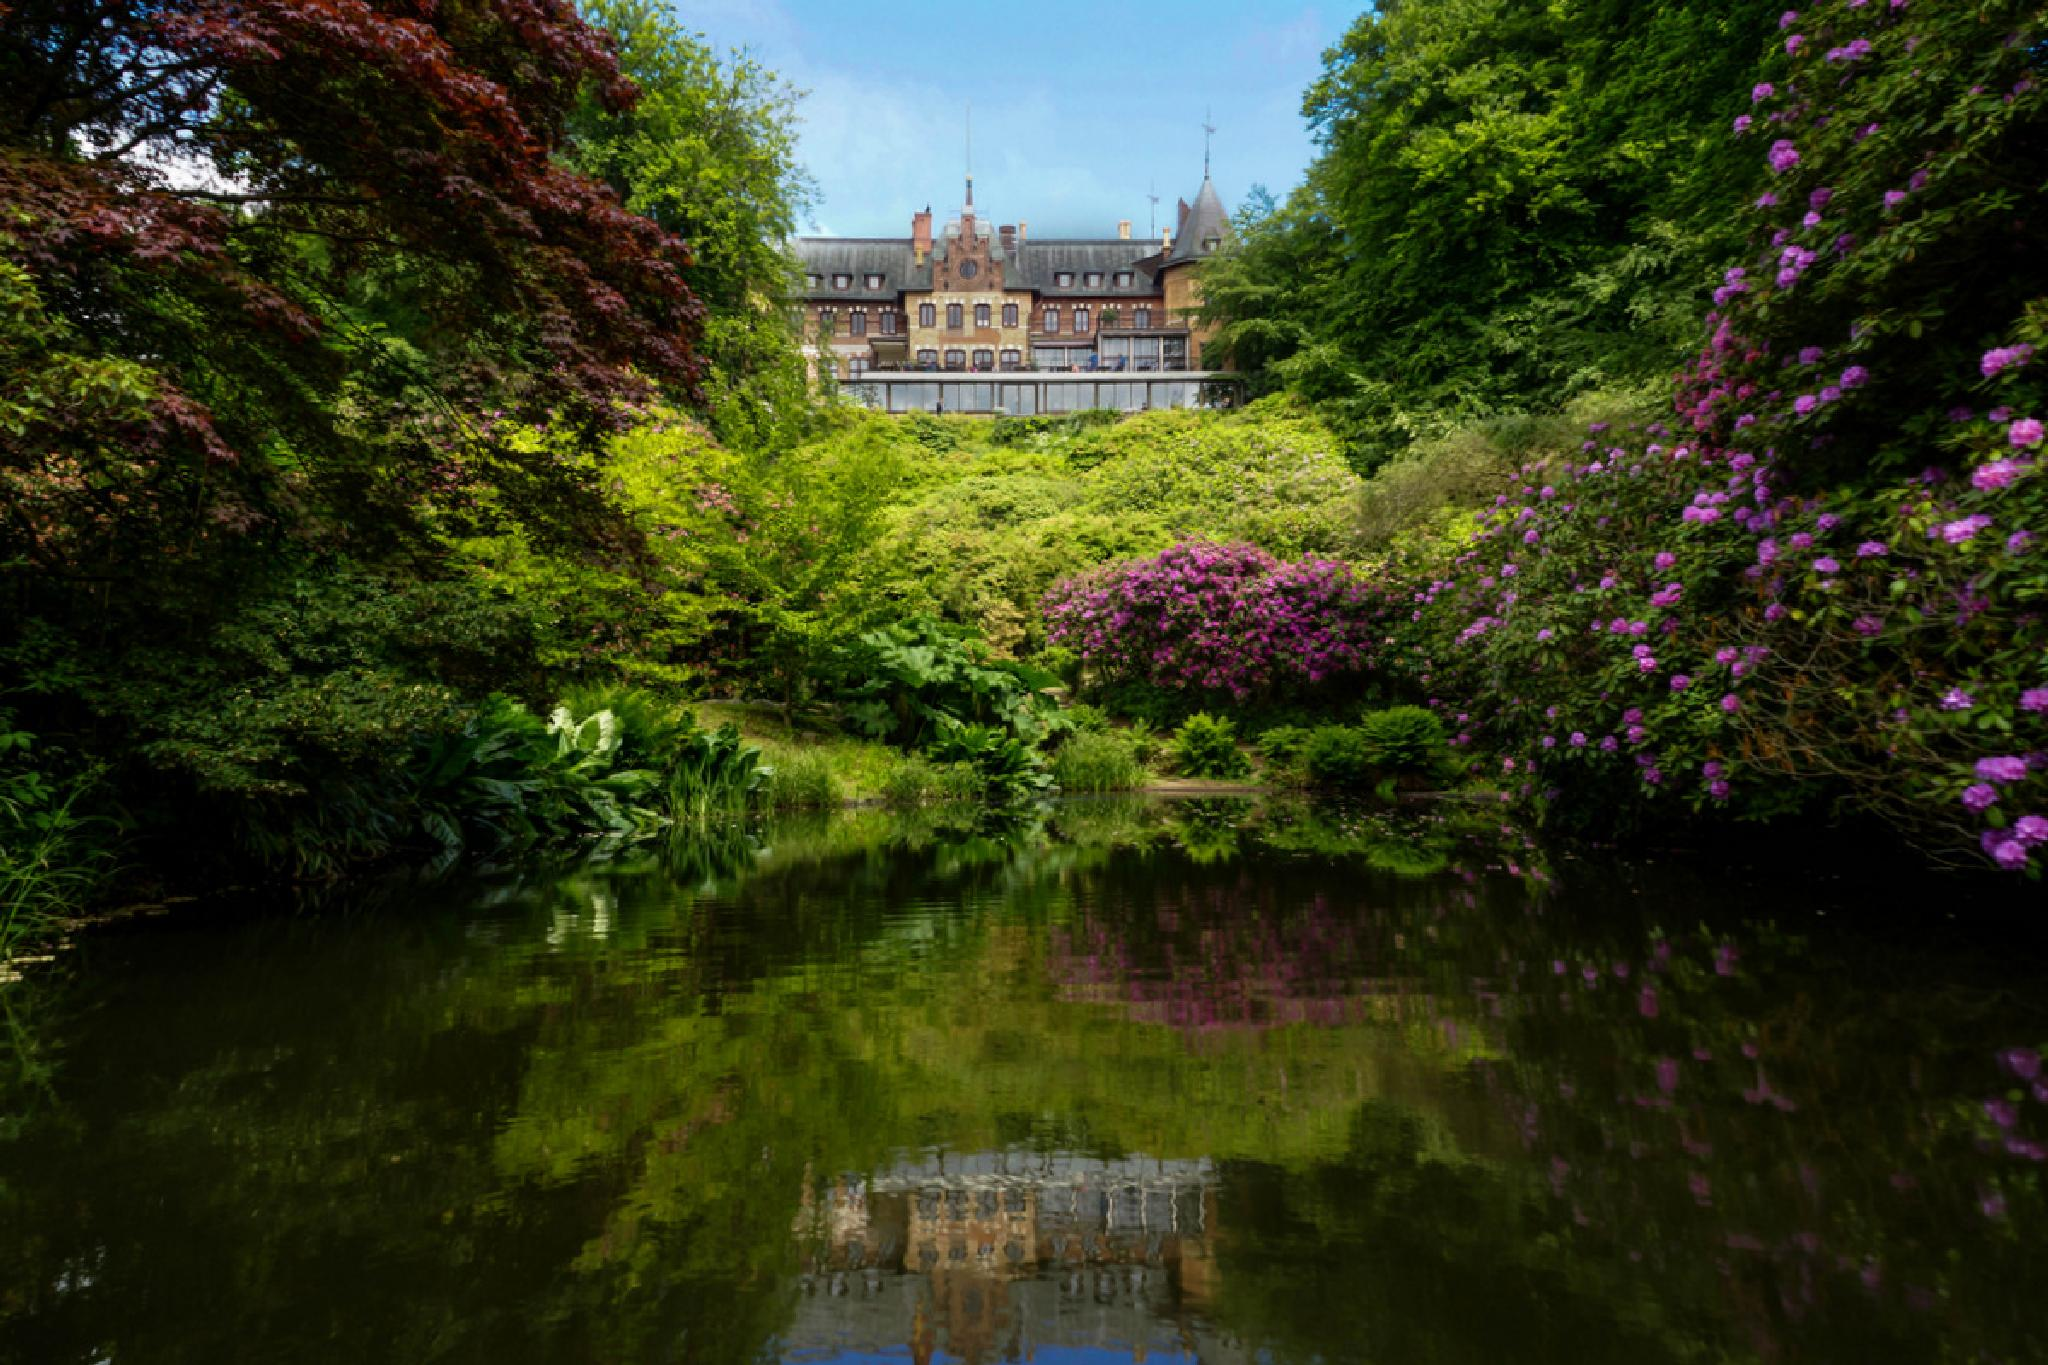 Sofiero castle by Jane.lindbladh